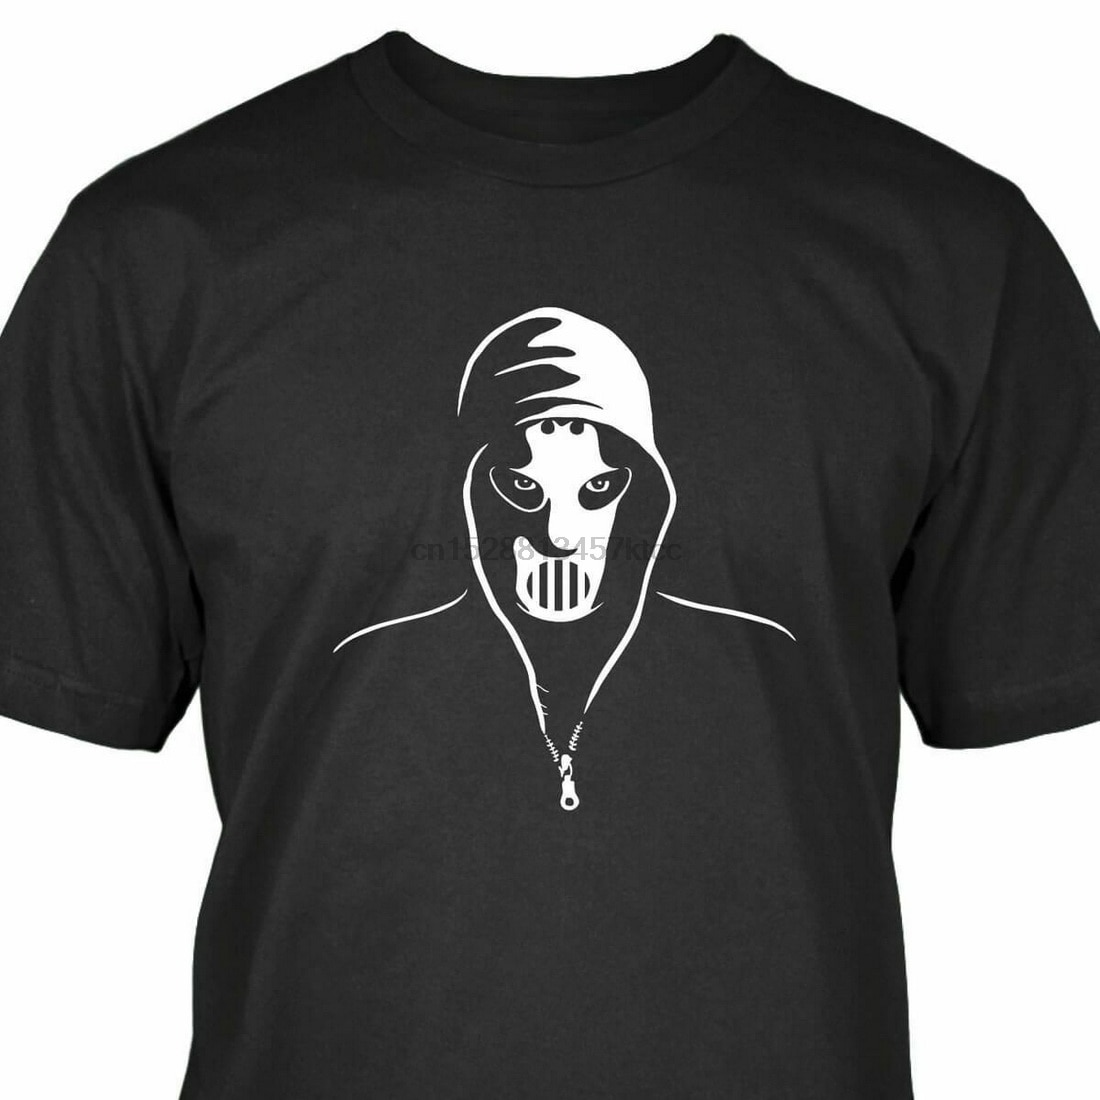 Angerfist Tops Tee T Shirt Hardcore Techno Gabber Moh T-Shirt Cotton Short Sleeve